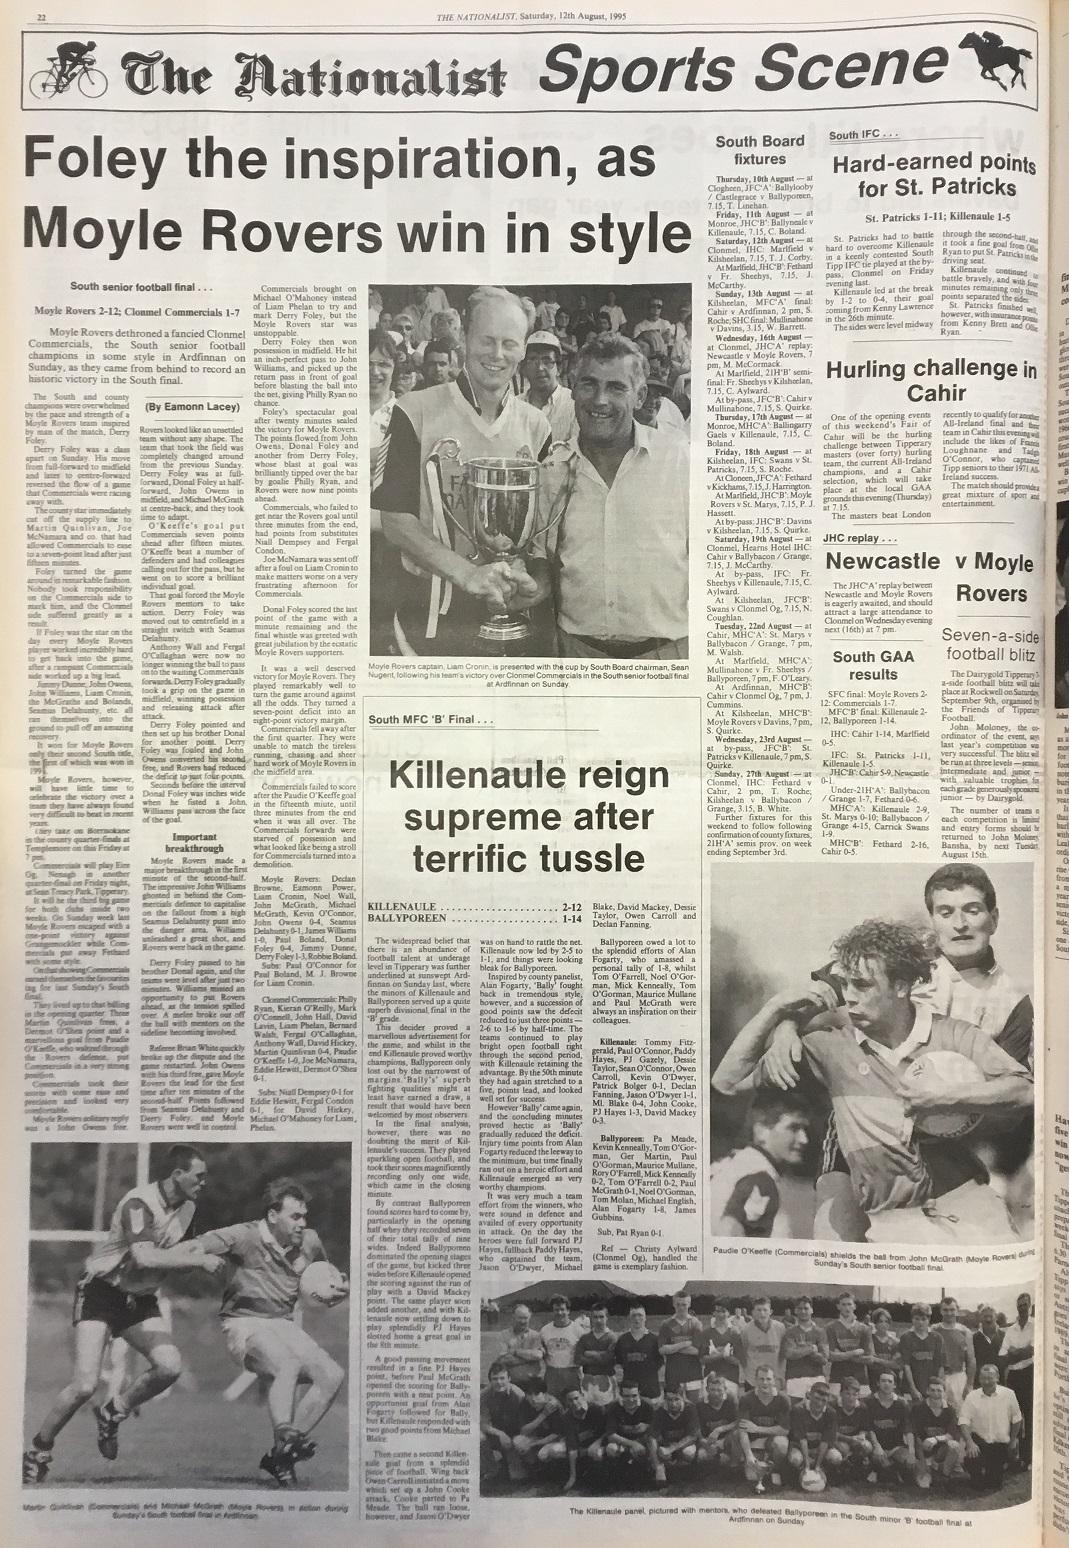 1995 South football final